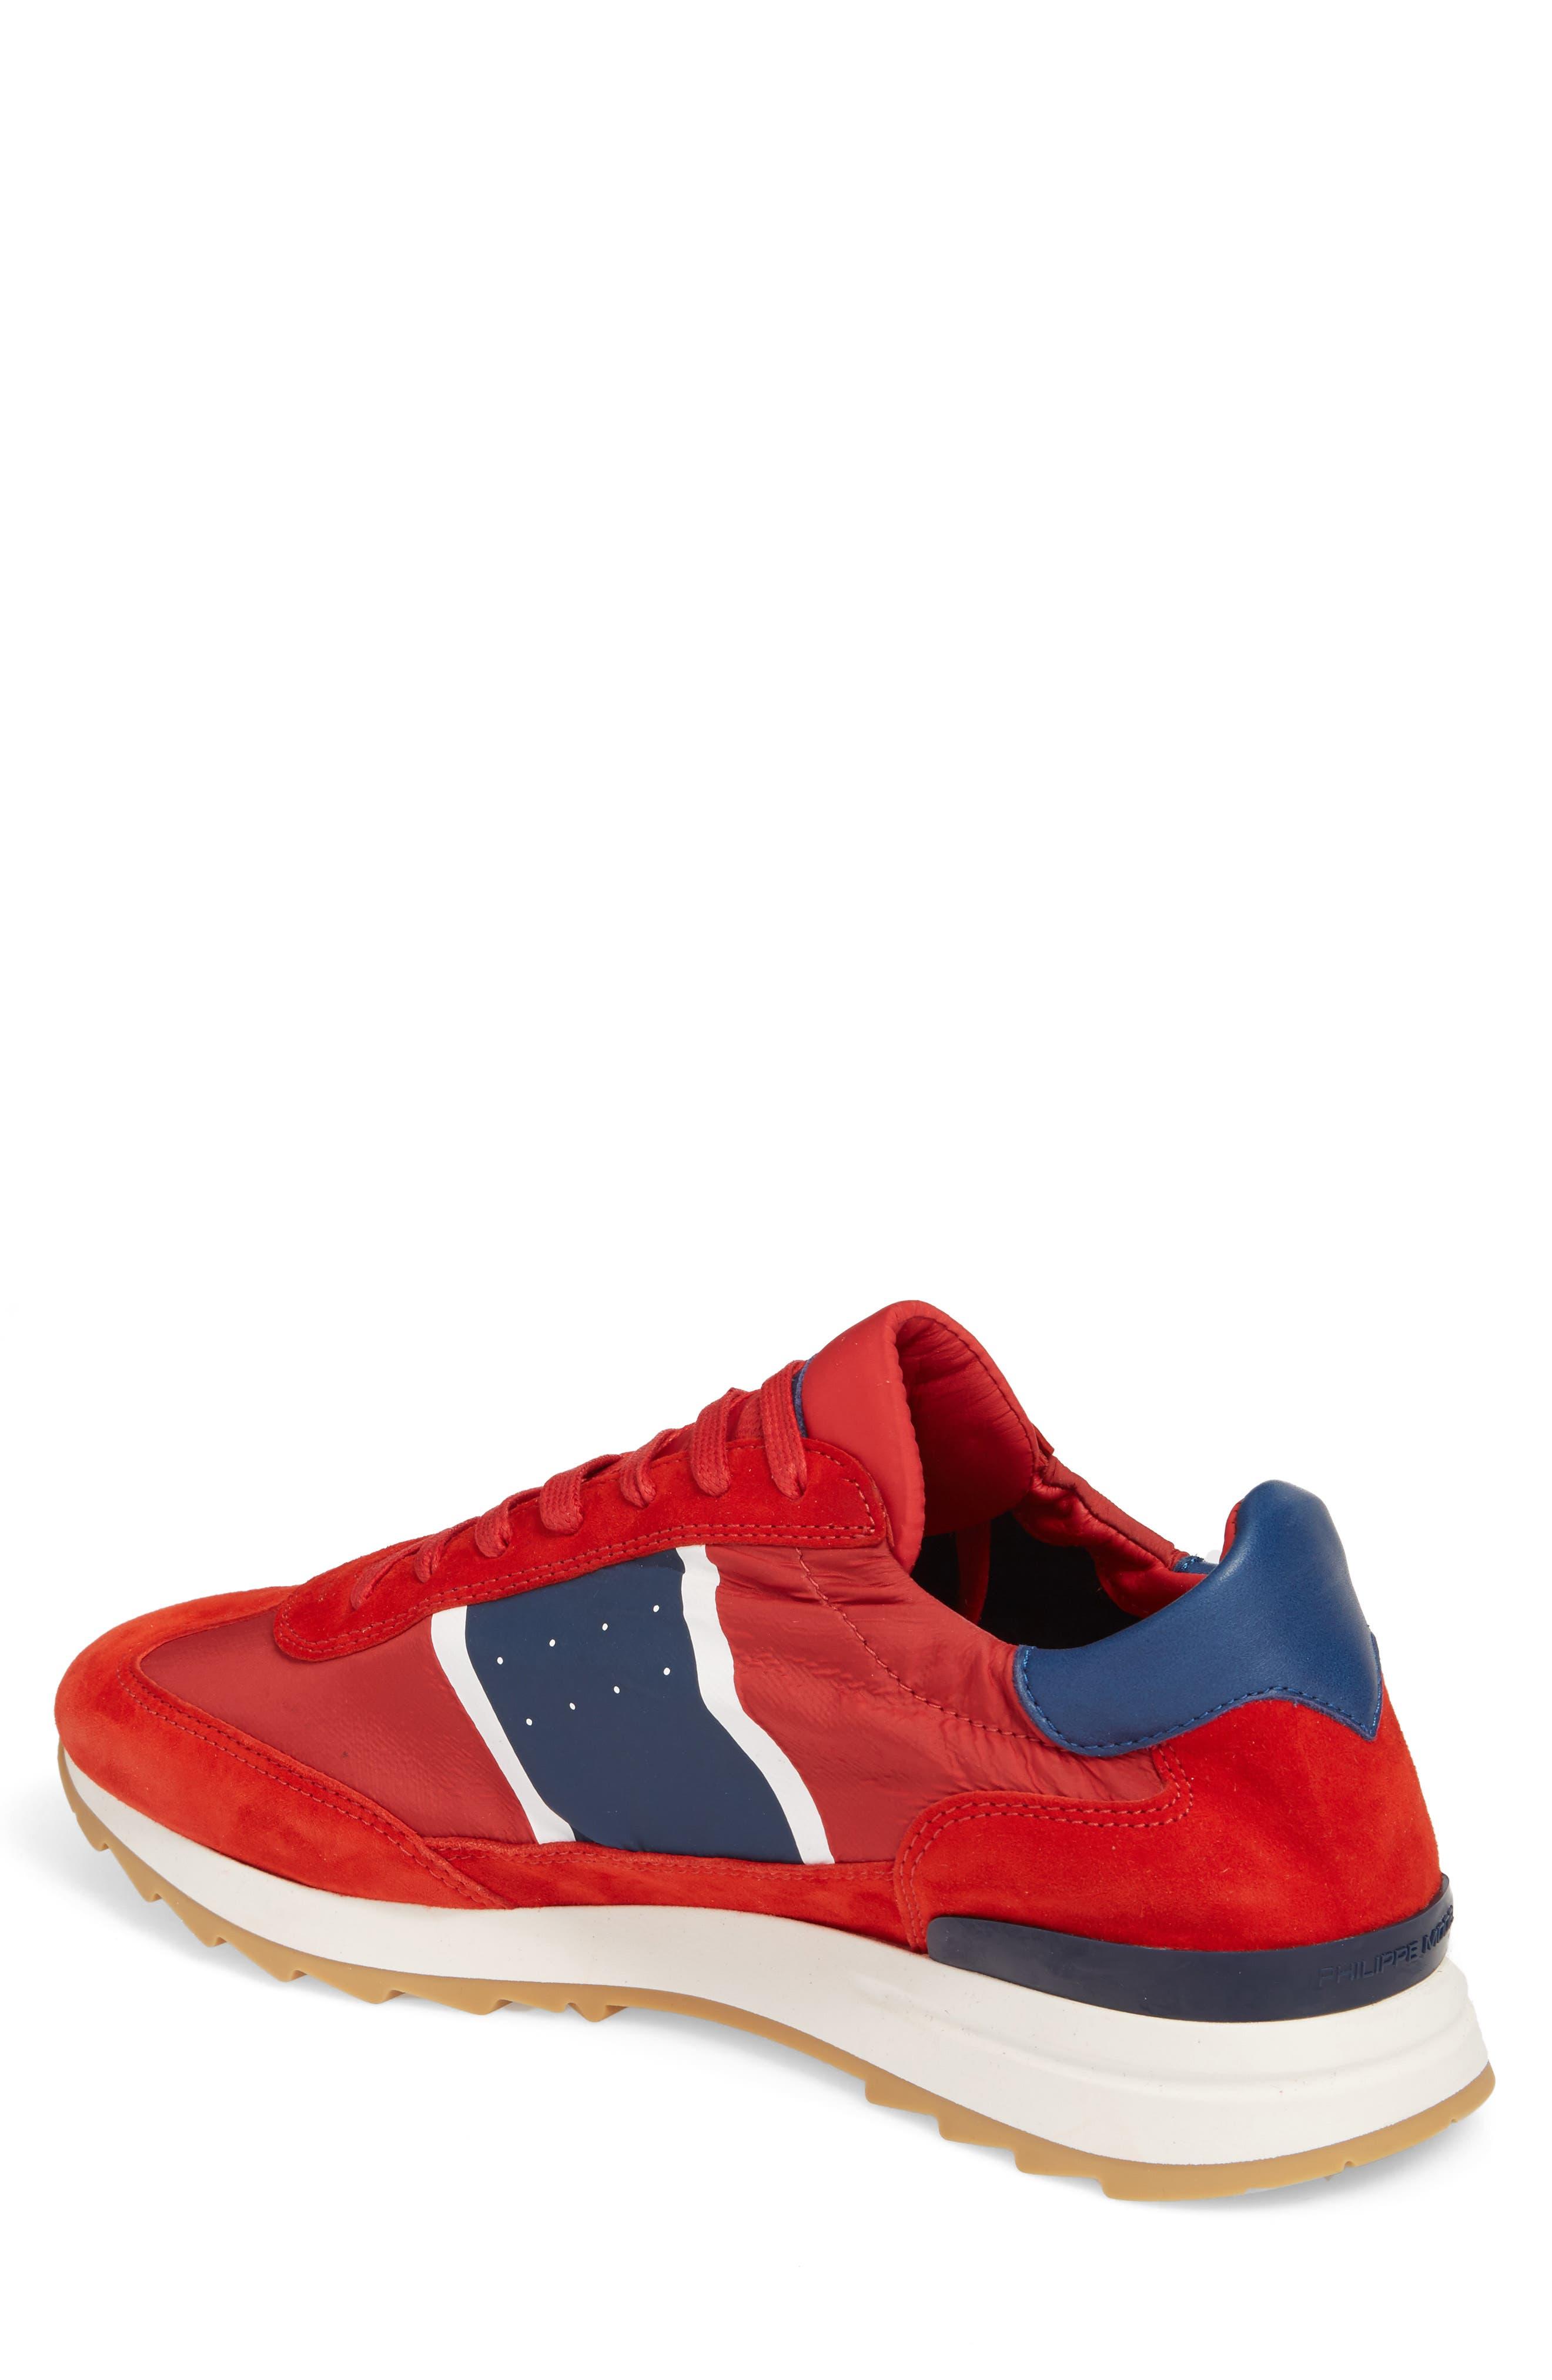 Toujours Sneaker,                             Alternate thumbnail 2, color,                             Red/ Blue